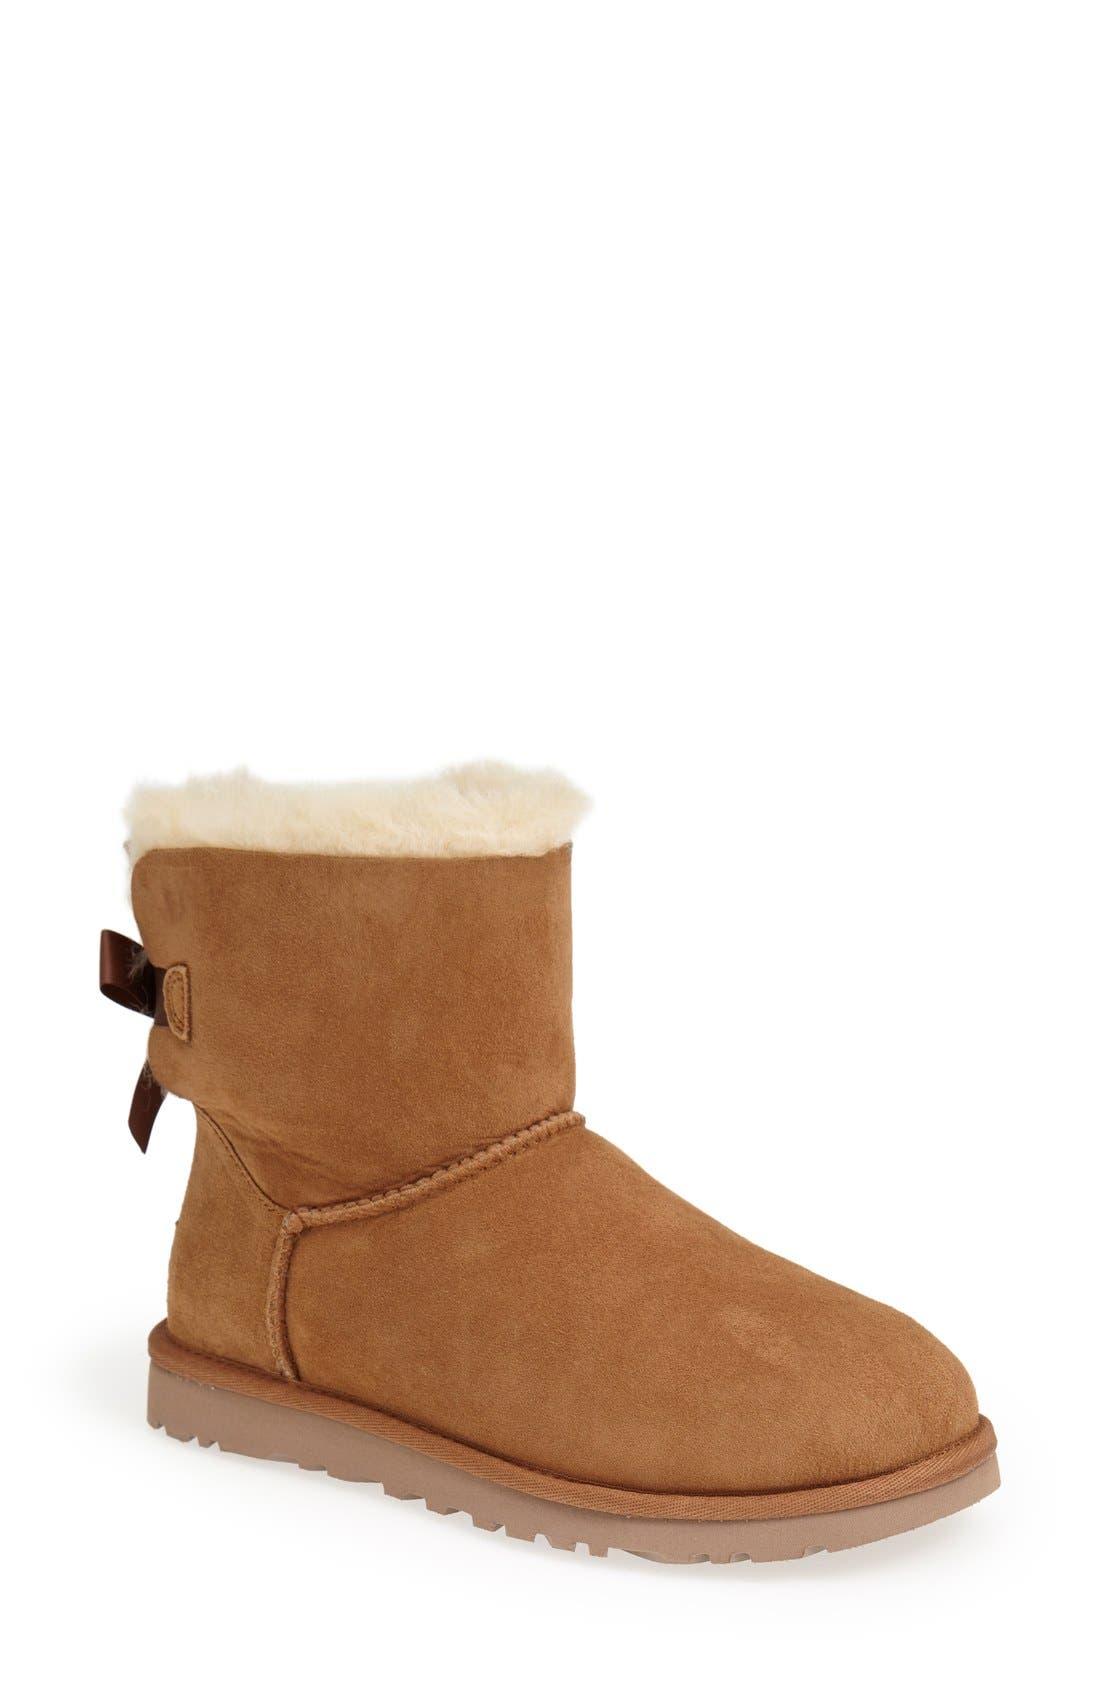 Main Image - UGG® 'Mini Bailey Bow' Boot (Women)